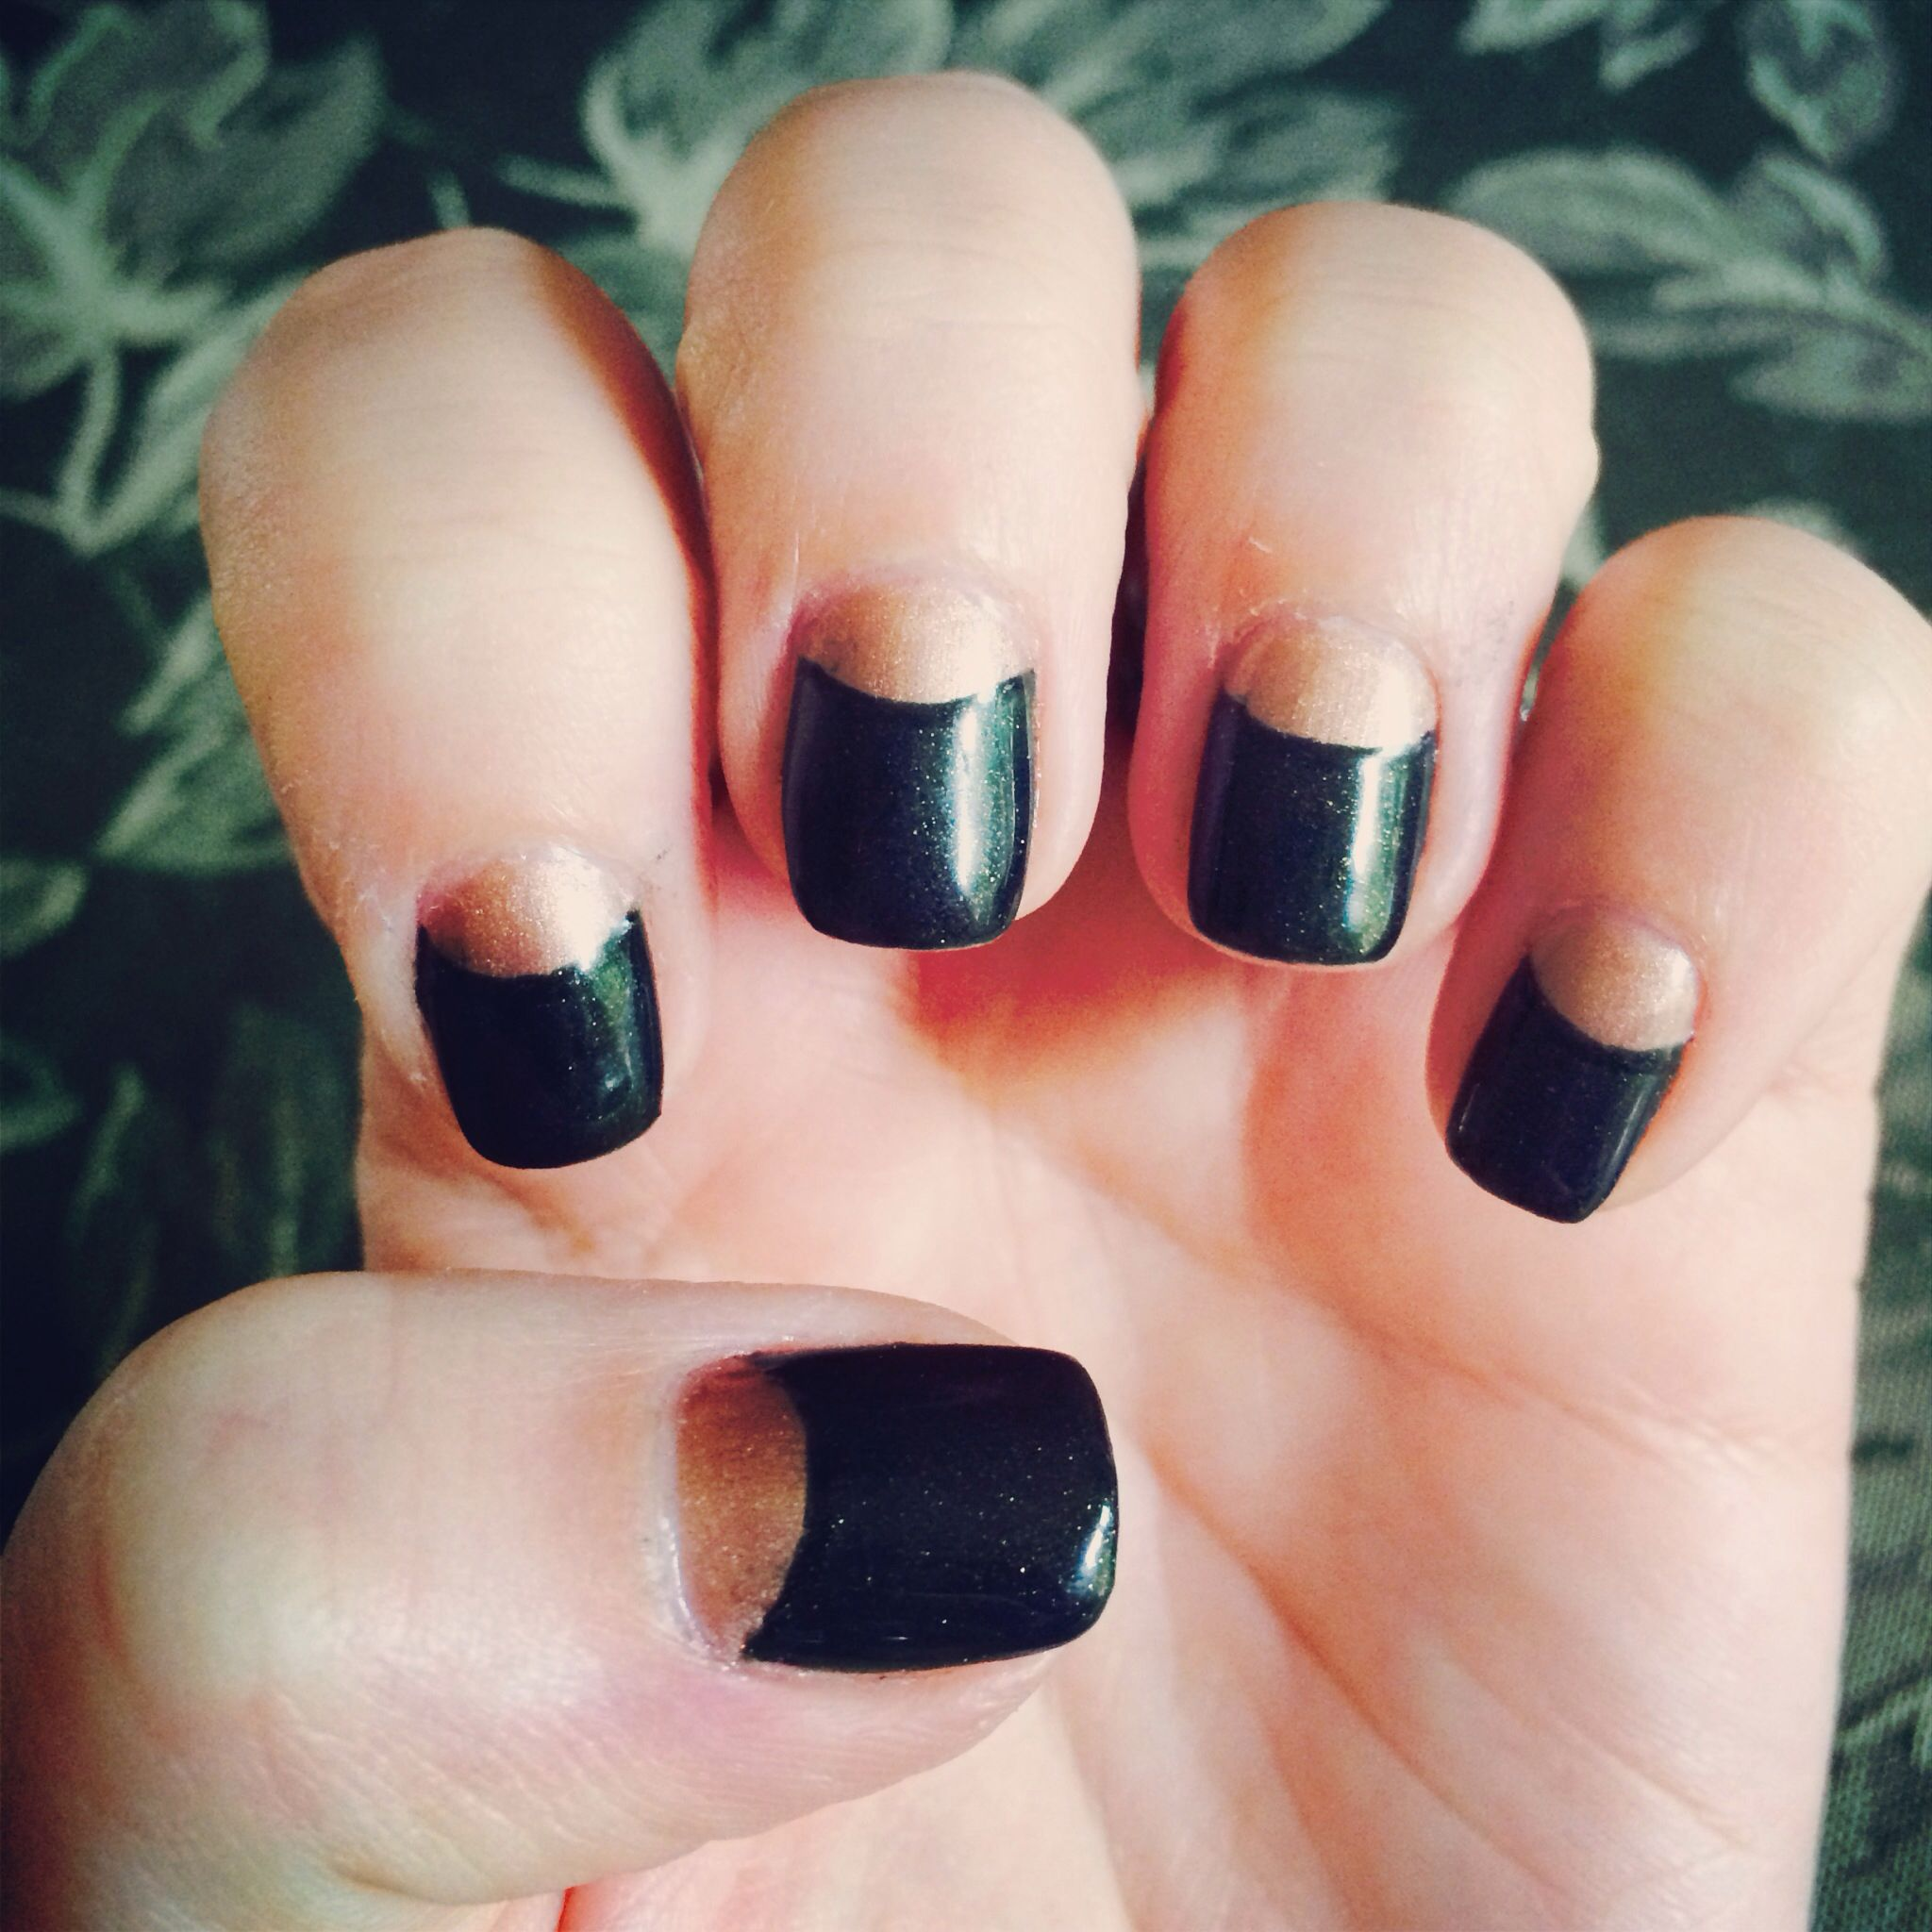 Reverse French nail art | Nails | Pinterest | Nail art, Reverse ...